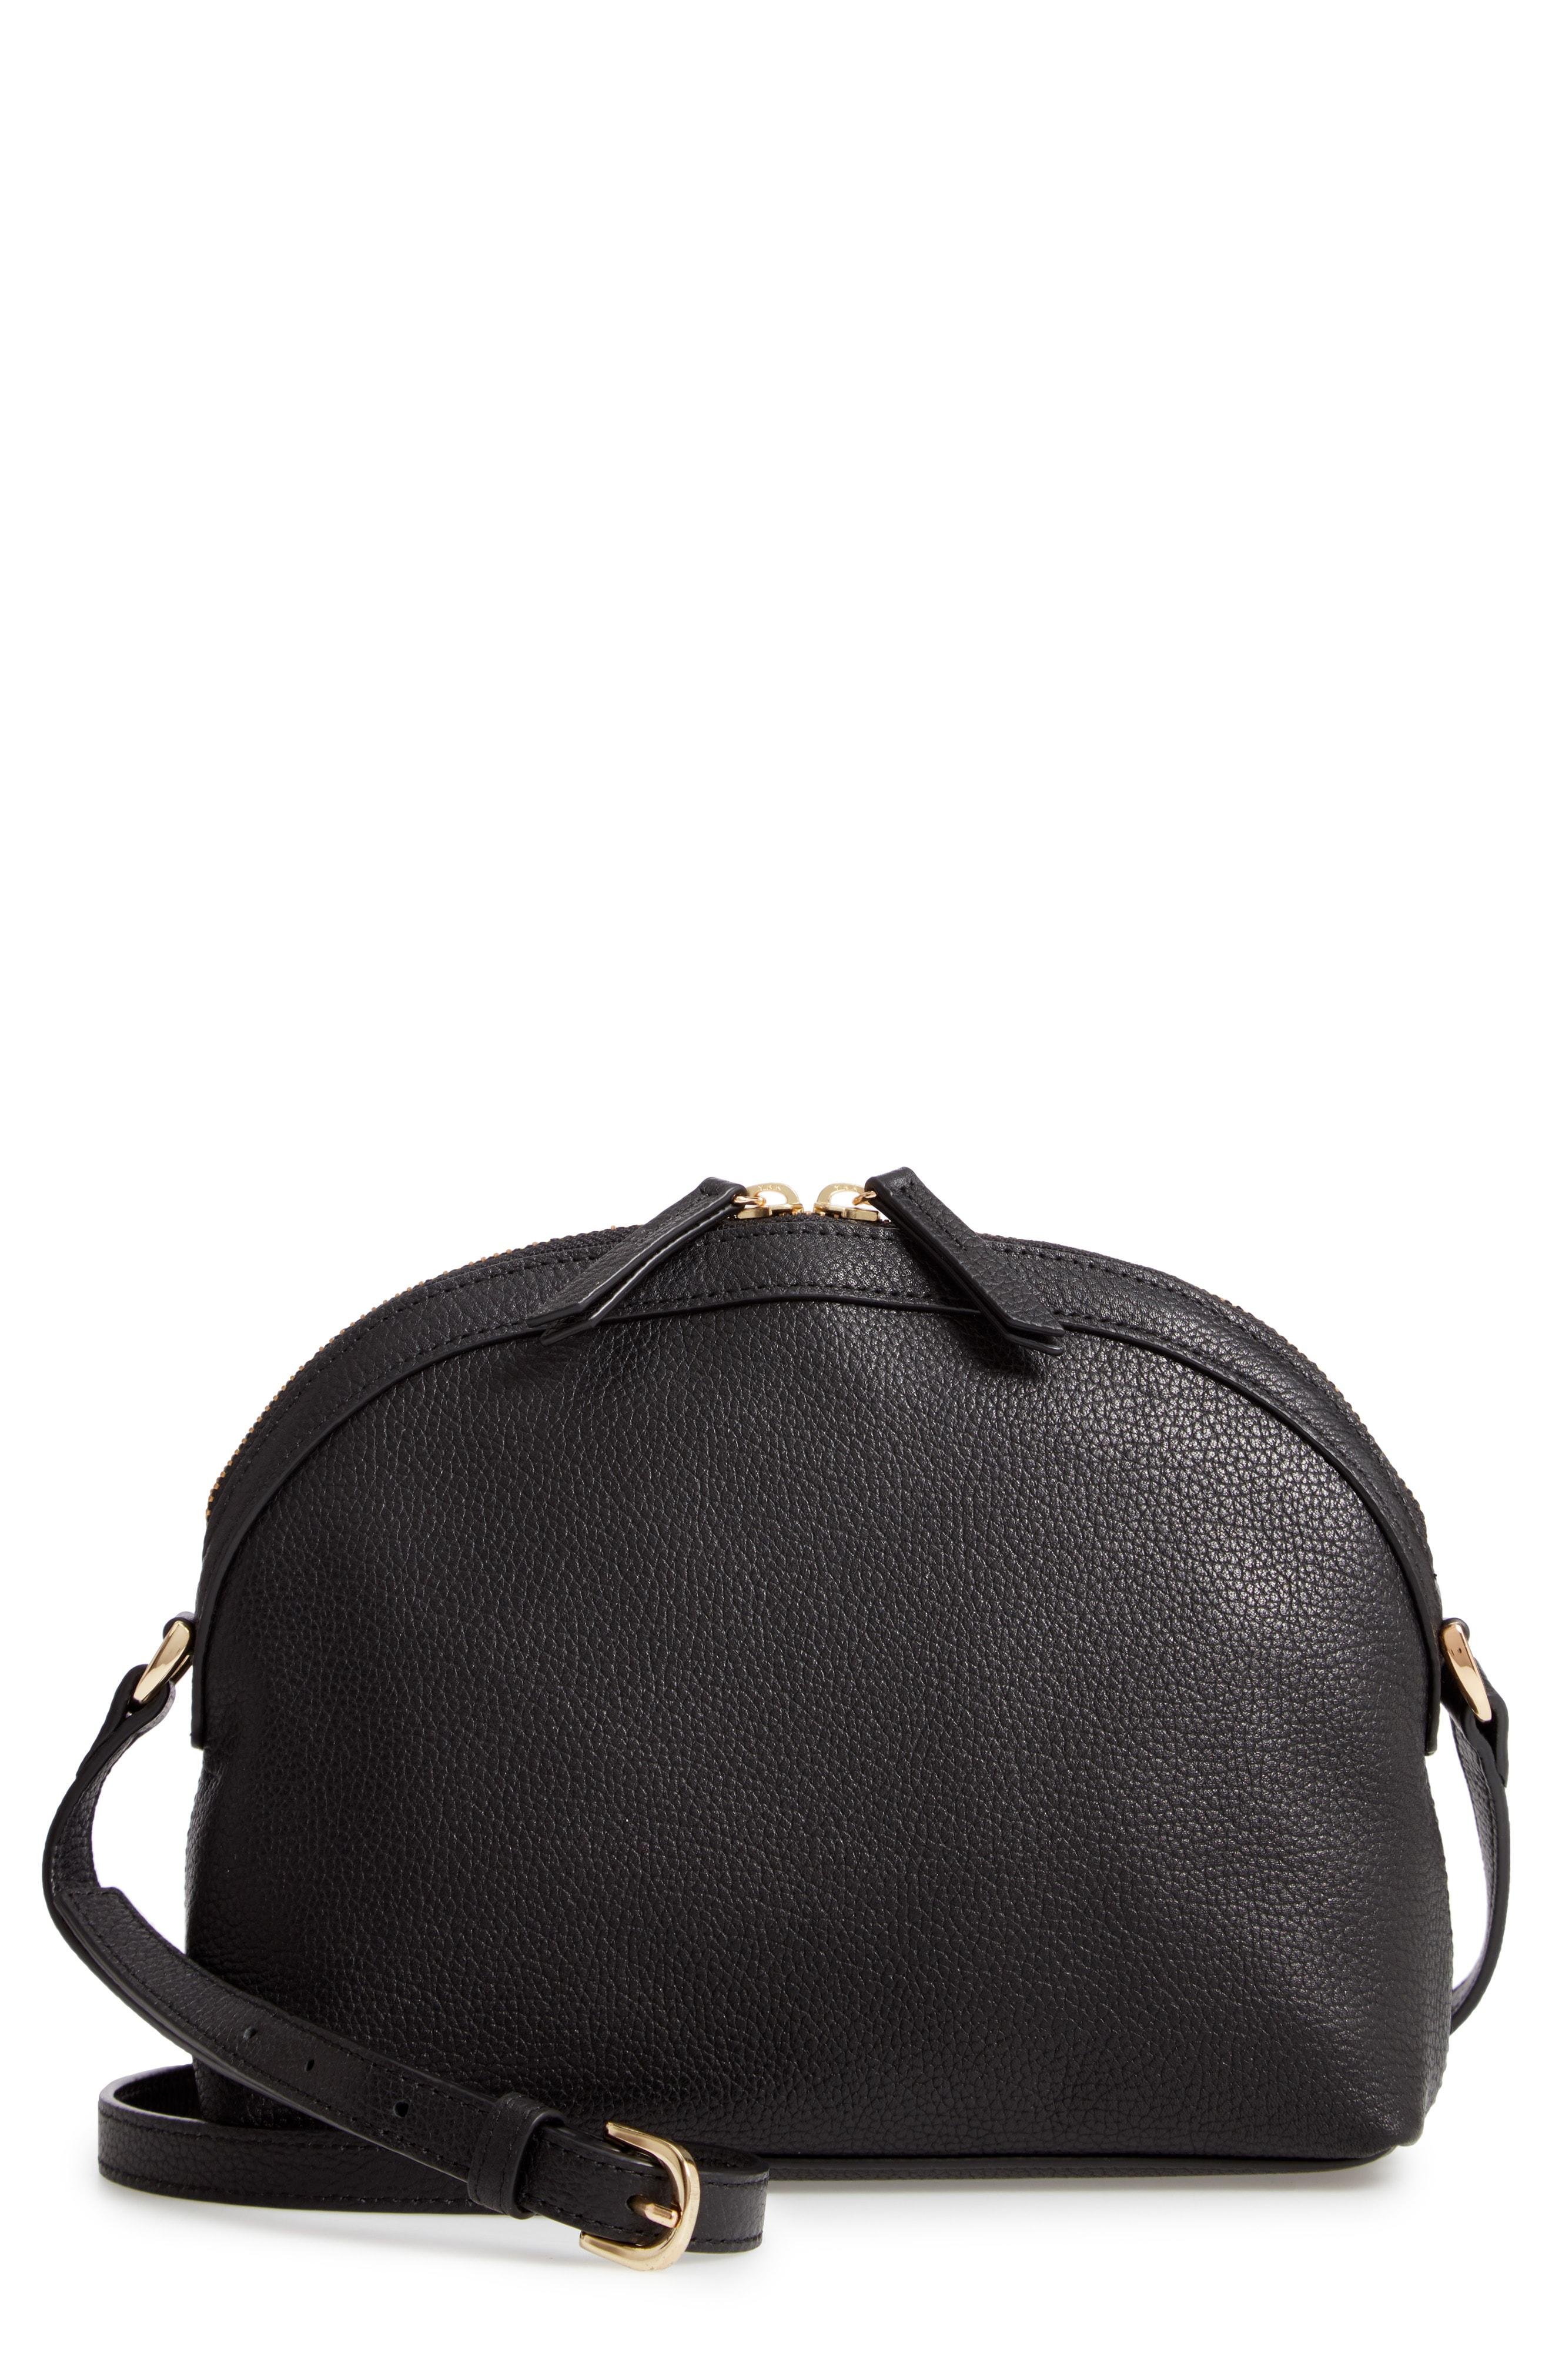 86615b3569ad Nordstrom Half Moon Leather Crossbody Bag - in Black - Lyst